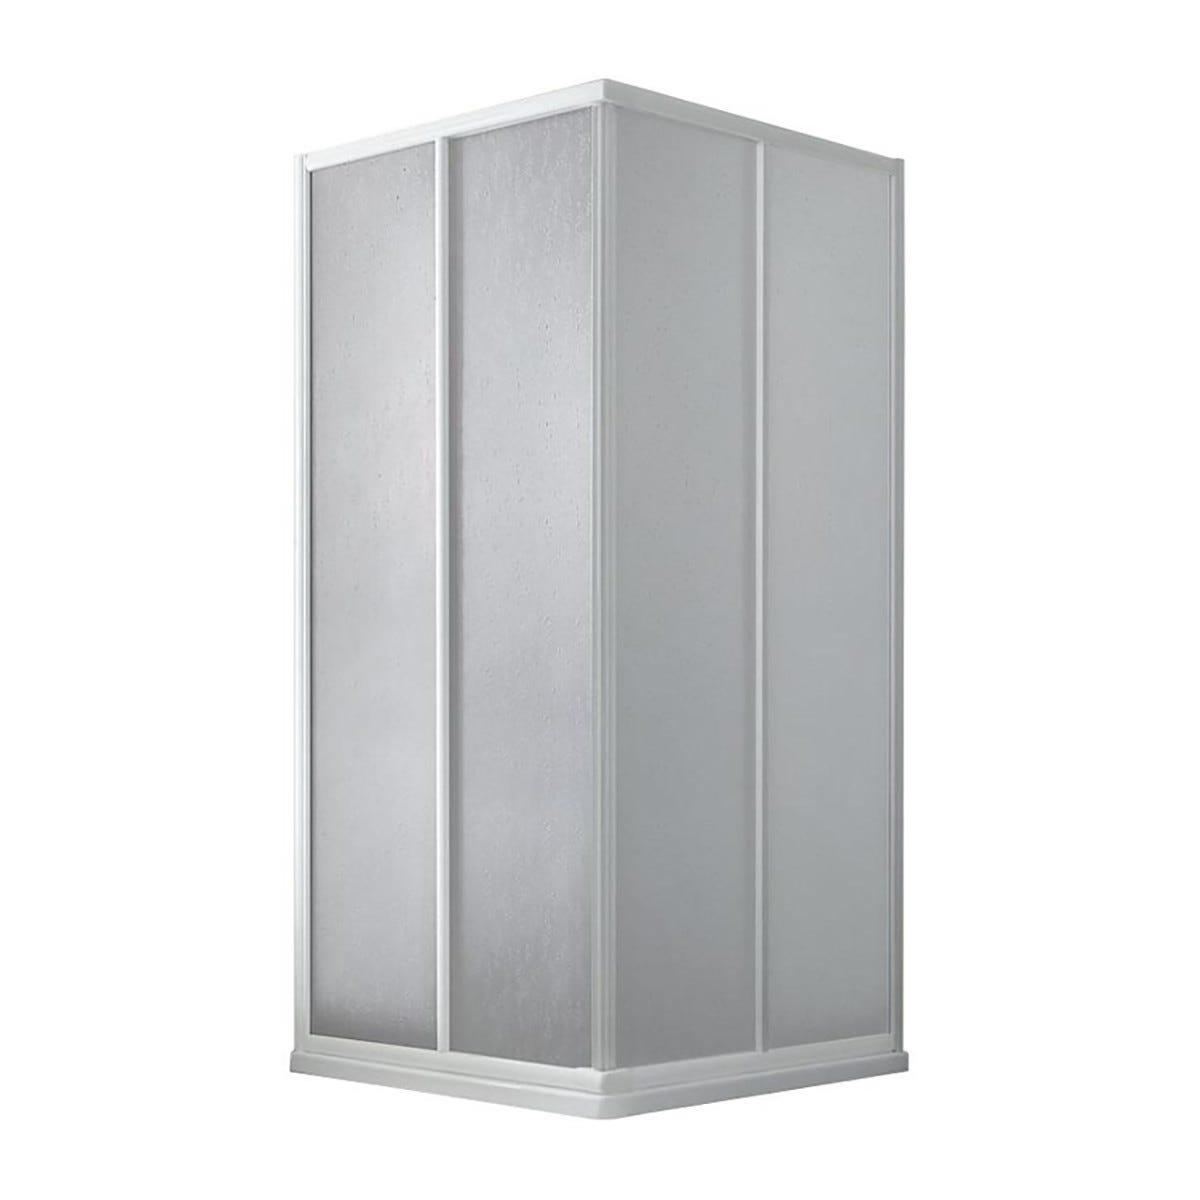 box doccia rettangolare bahamas (65-80)x (75-90) h 183 cm acrilico 1,6 mm profili bianchi